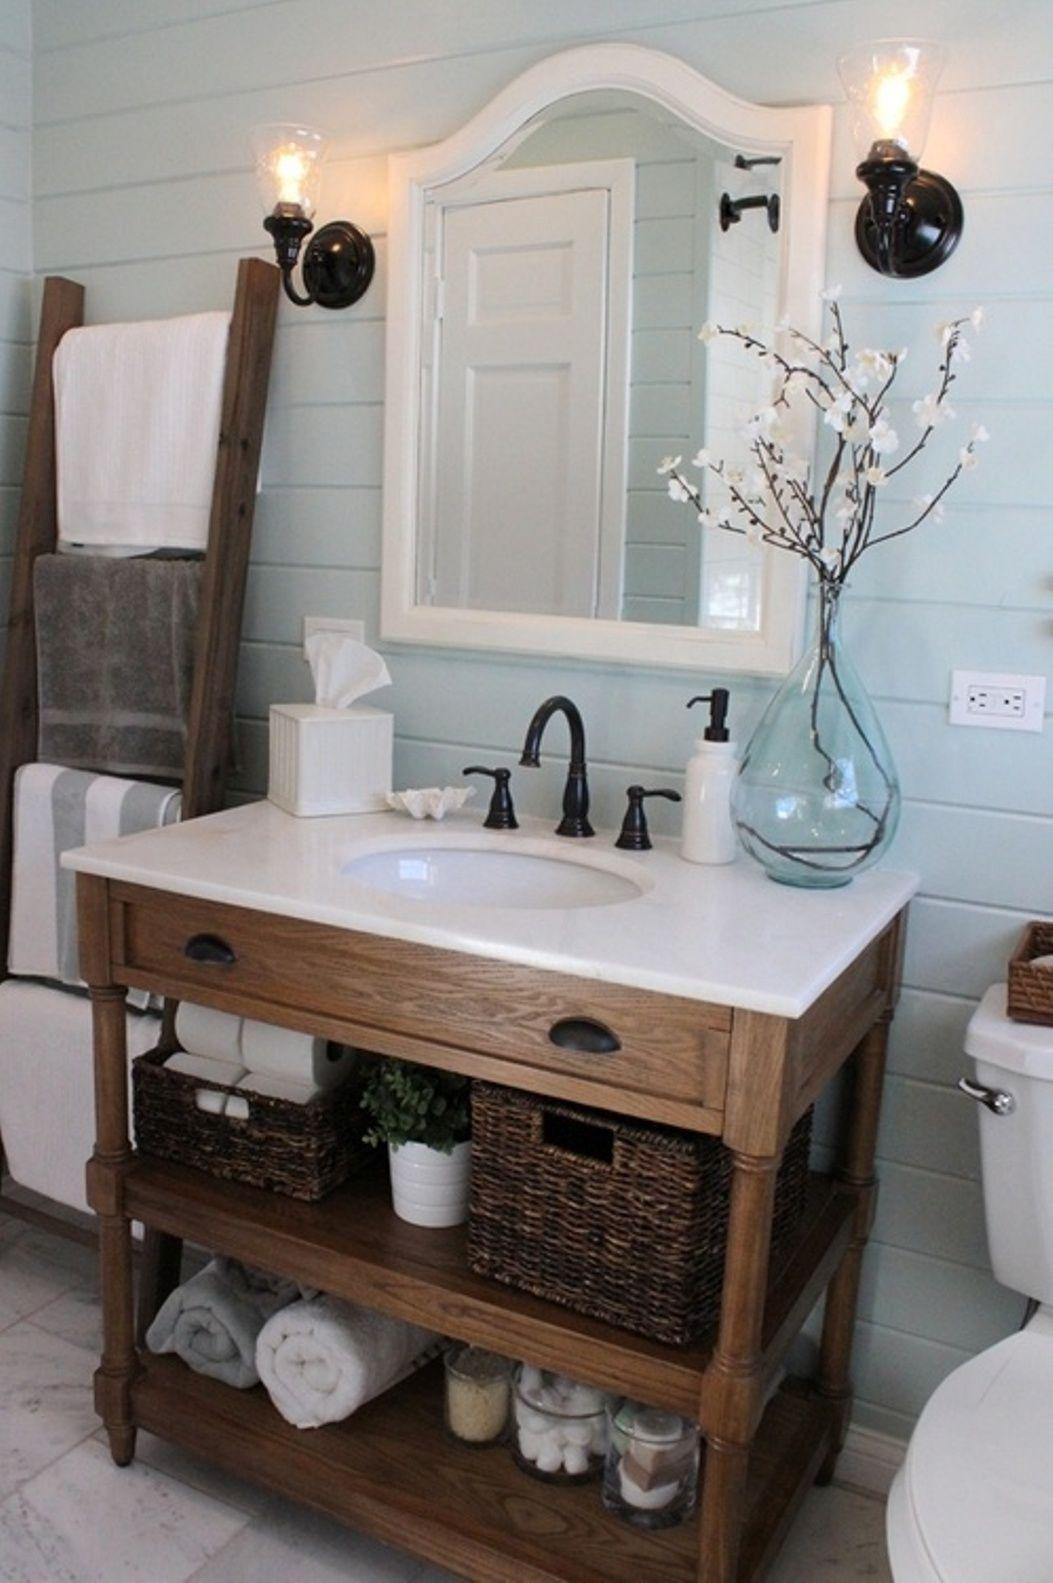 17 Inspiring Rustic Bathroom Decor Ideas for Cozy Home ... on Rural Bathroom  id=97367